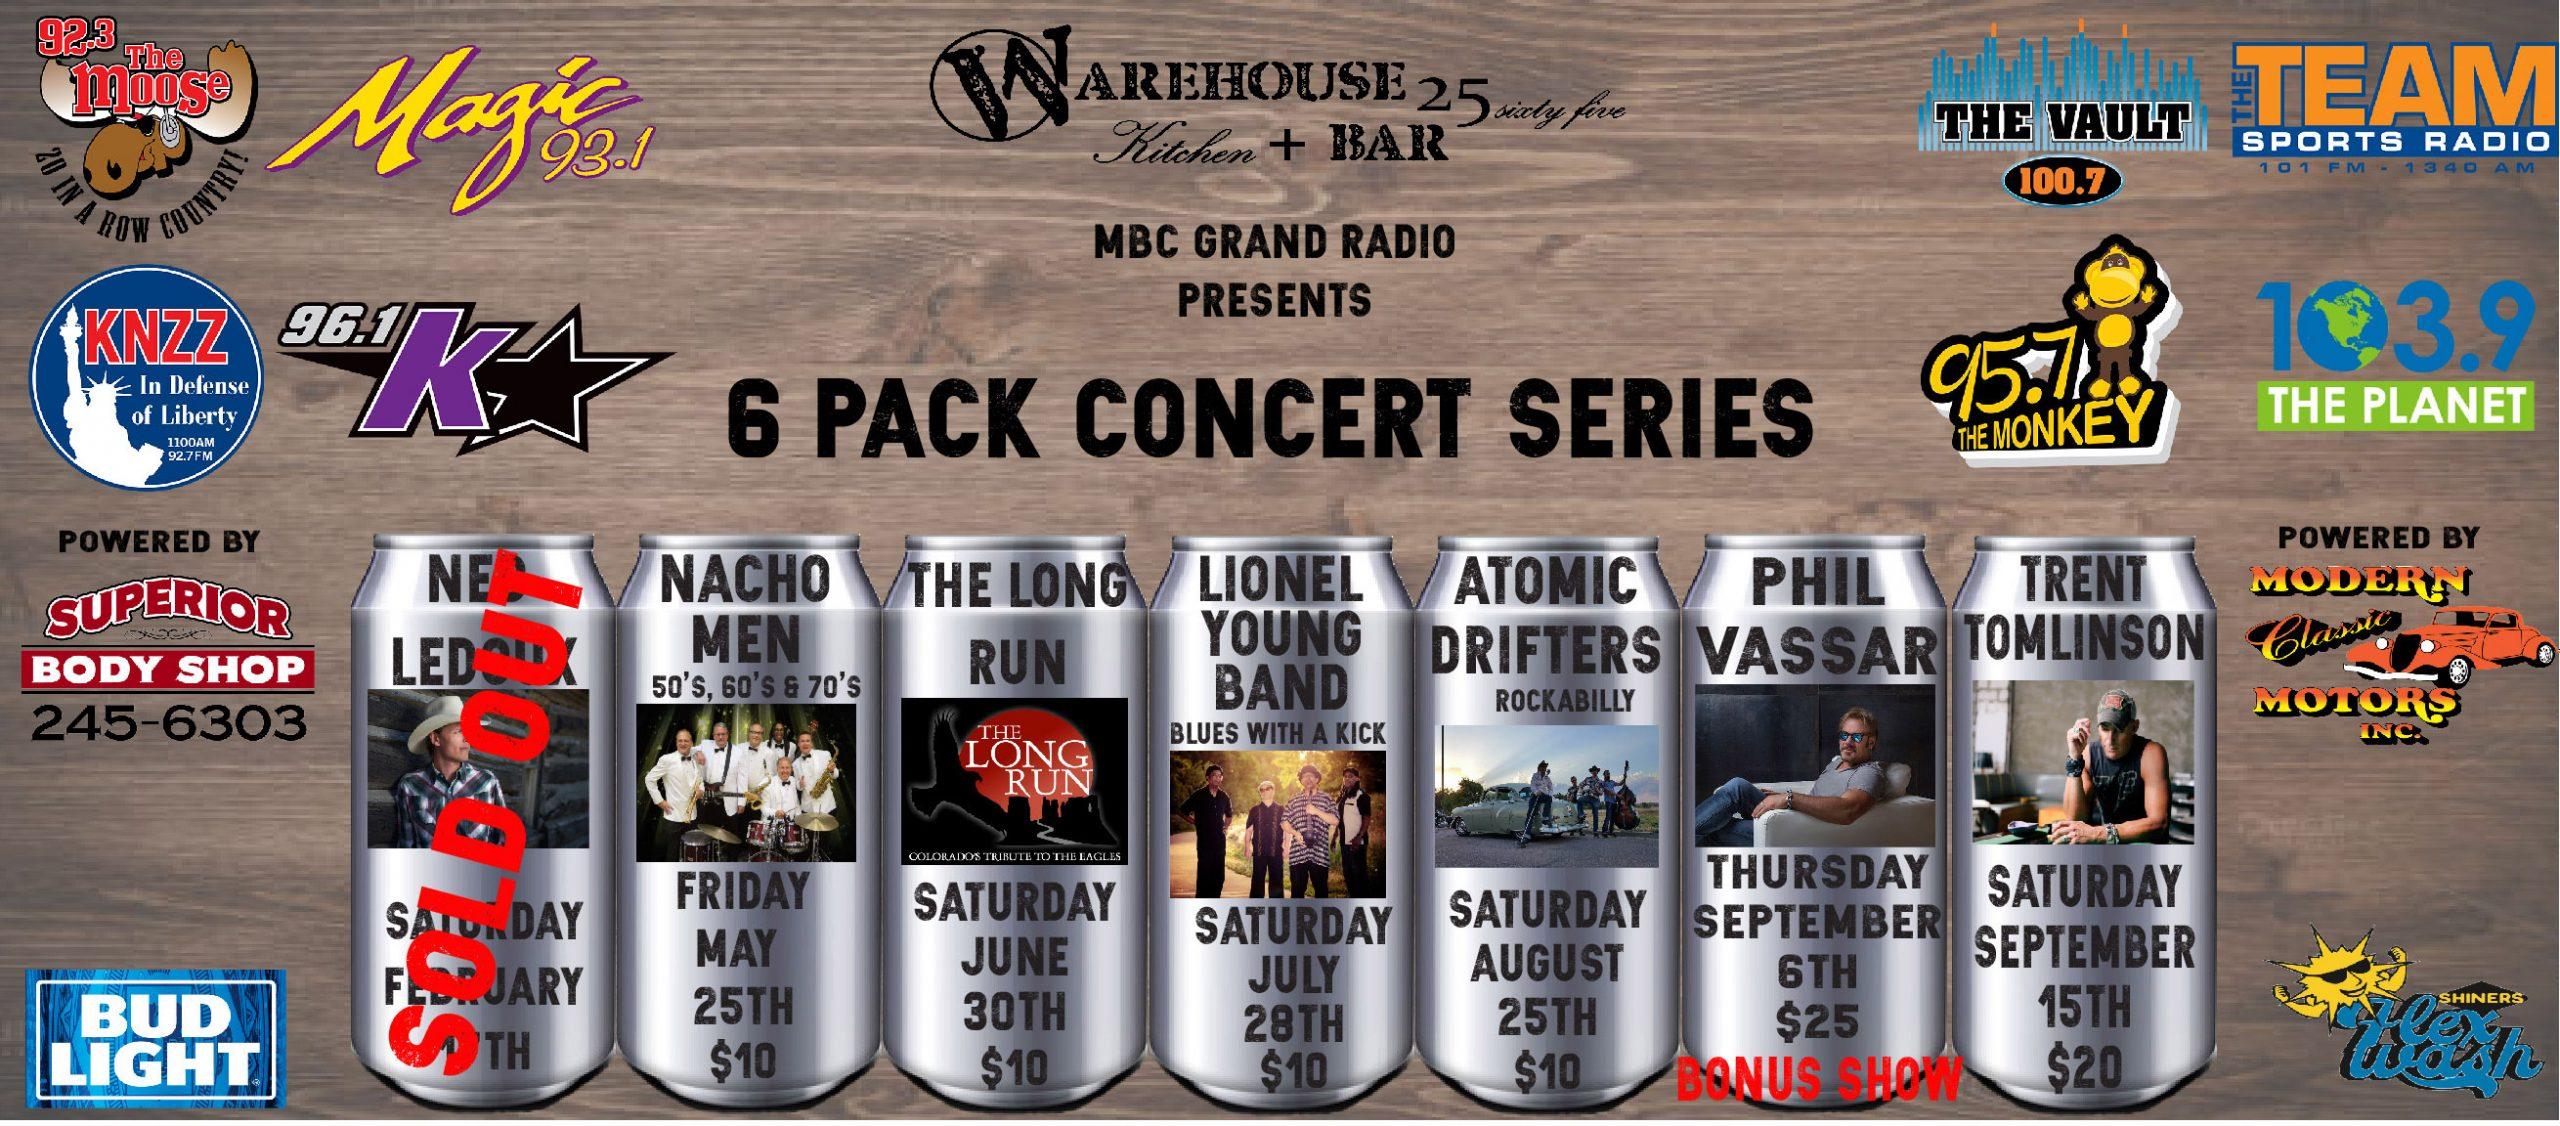 Feature: https://www.eventbrite.com/o/6-pack-concert-series-16798219143